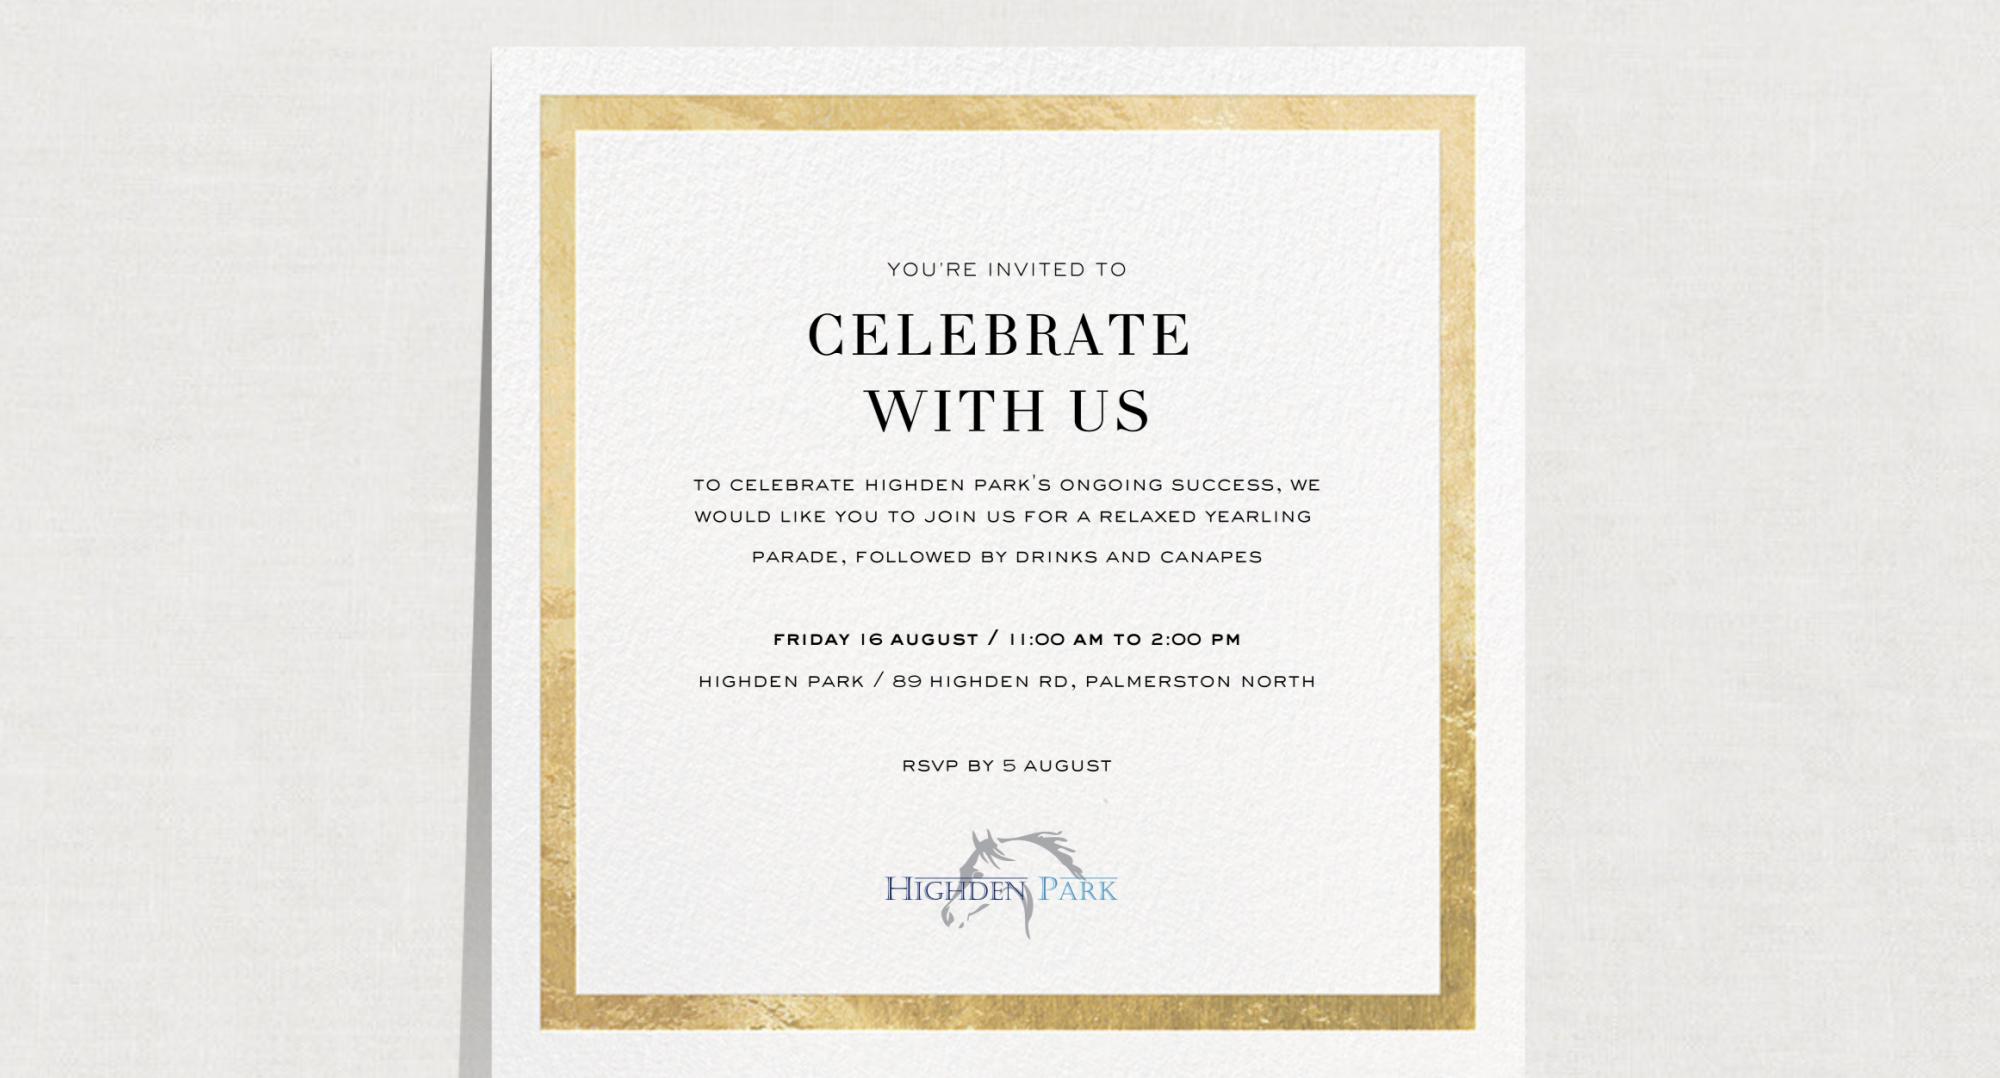 Highden Park Event Invite